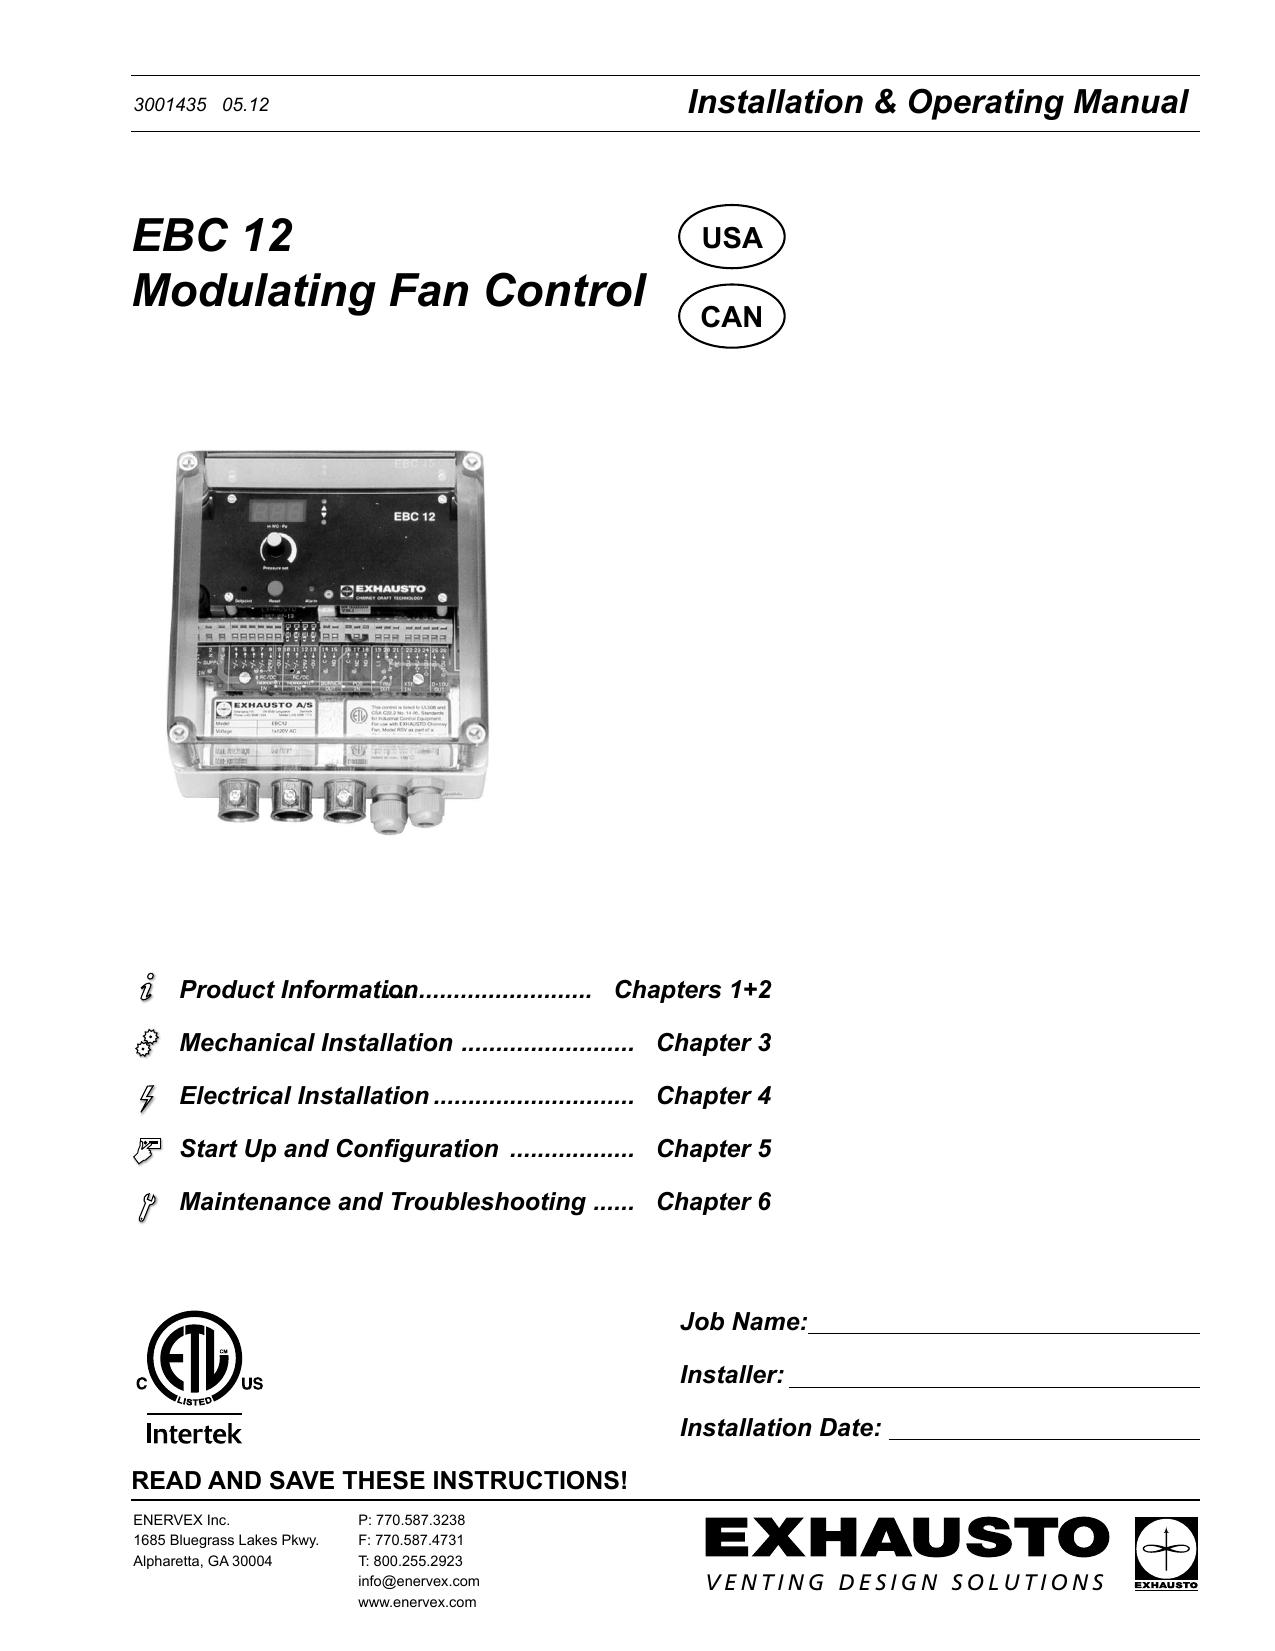 Ebc 12 Modulating Fan Control Enervex Source Exhausto Wiring Schematic